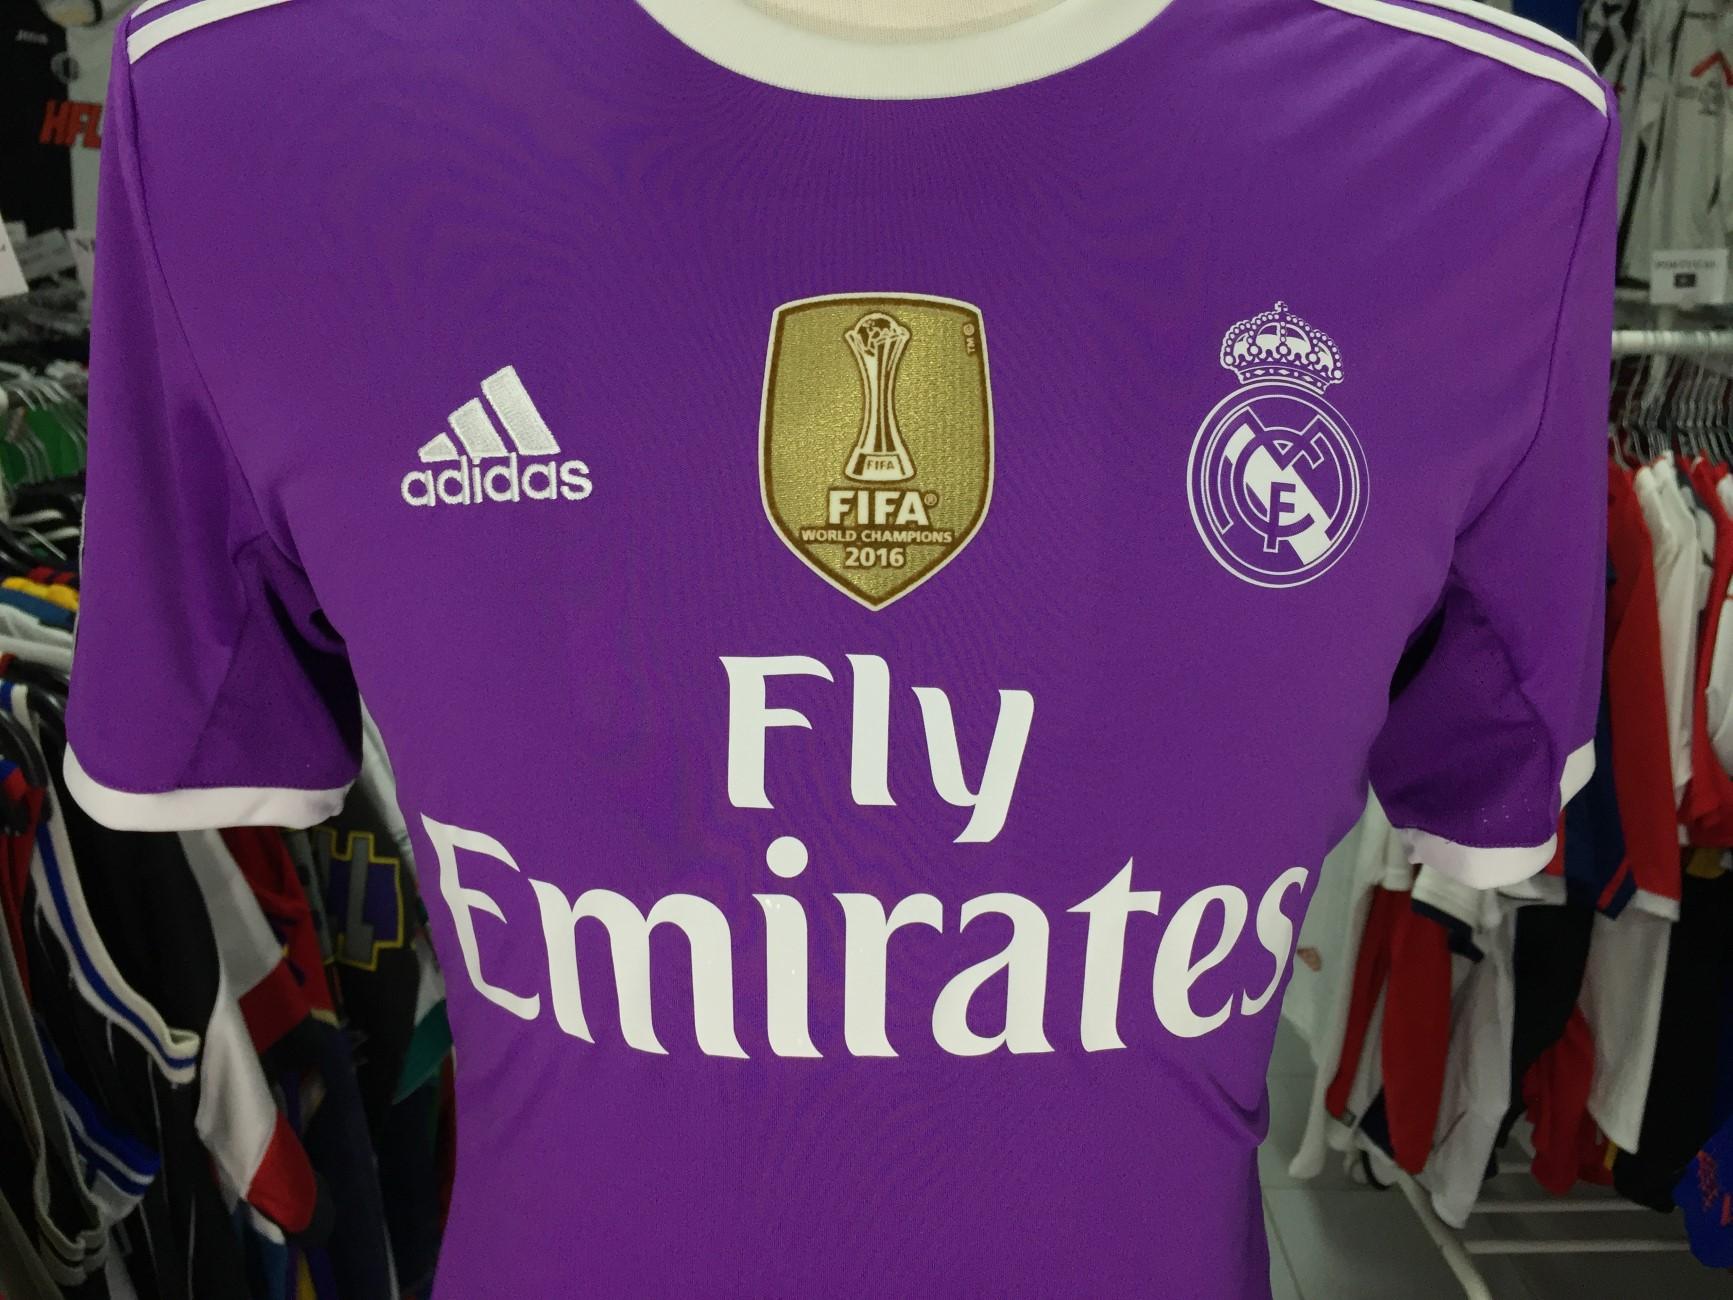 dd49062bad1a6 Real Madrid Away Shirt 2016-17 (S) Adidas CAmiseta Camisola ...